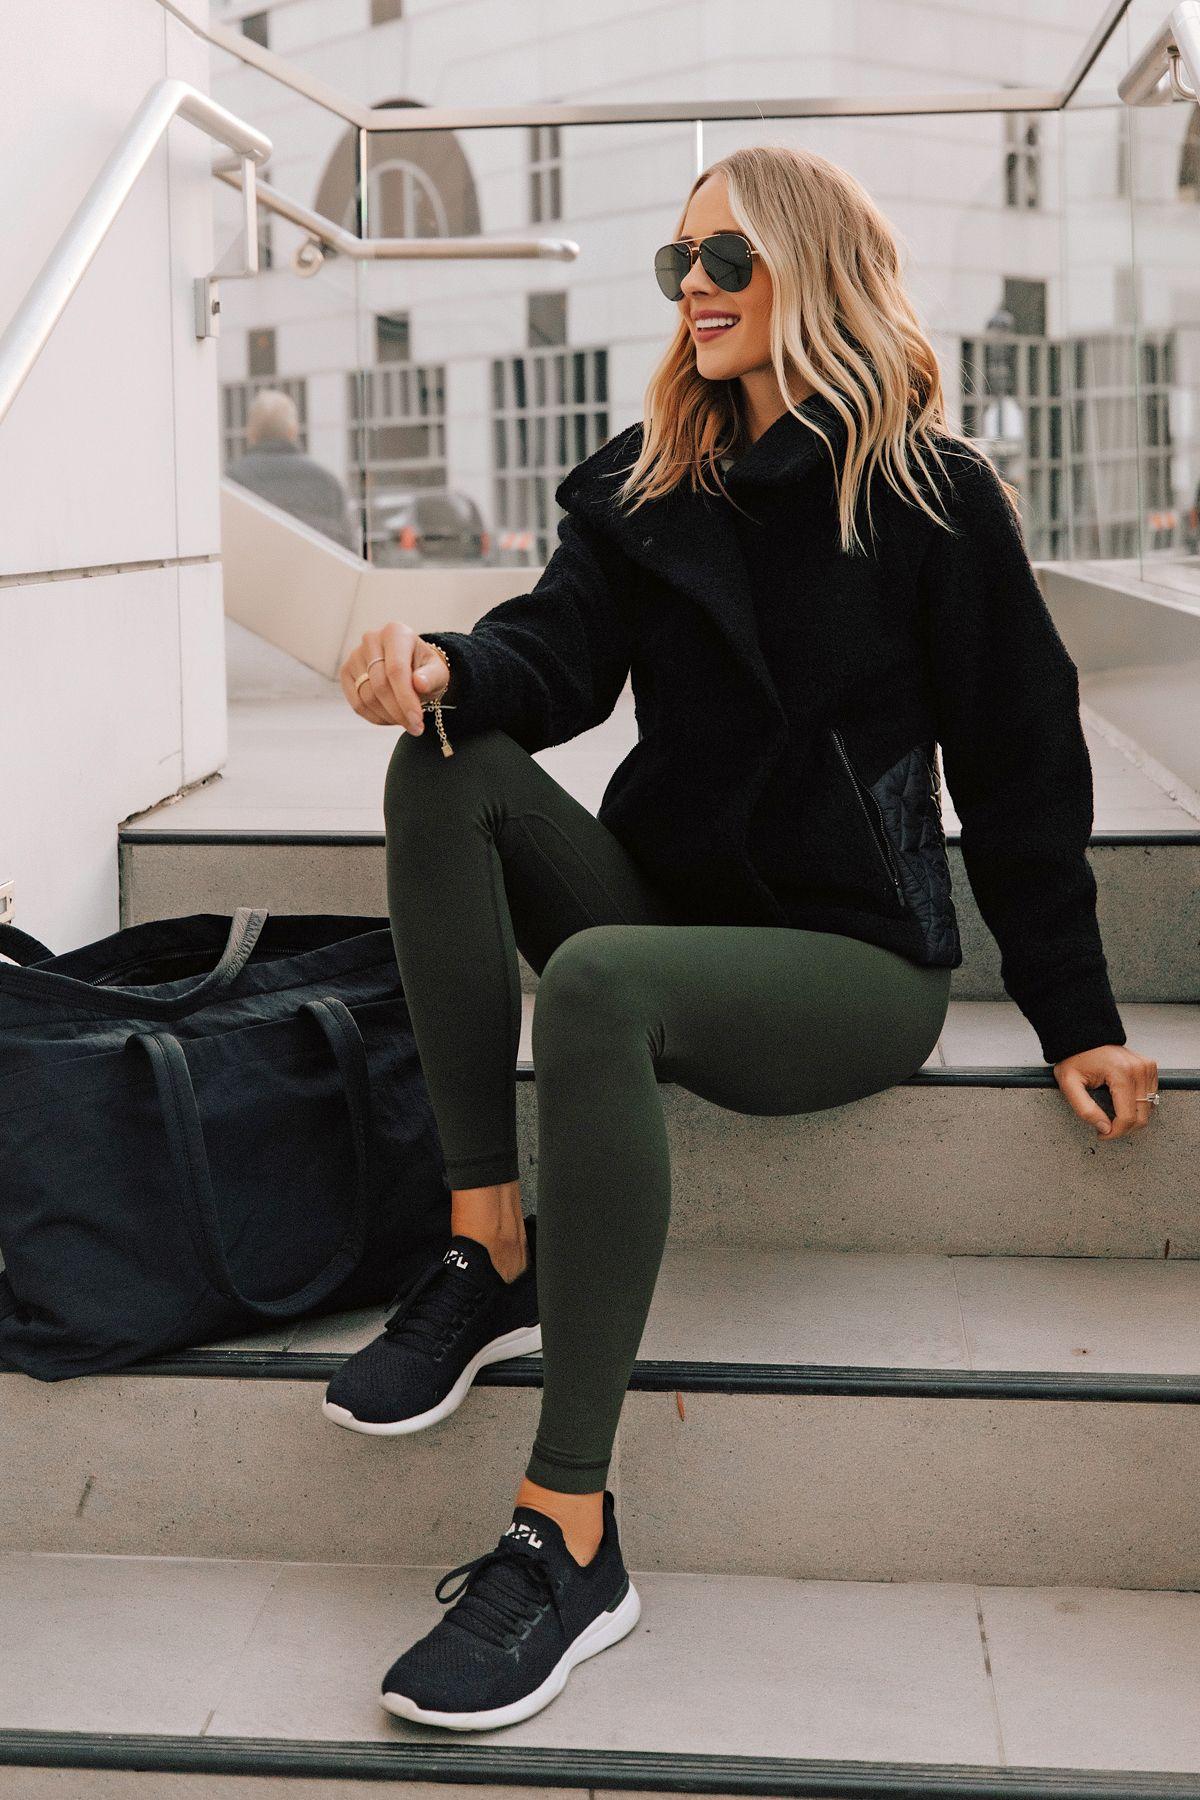 lululemon align leggings workout outfit | Fashion Jackson